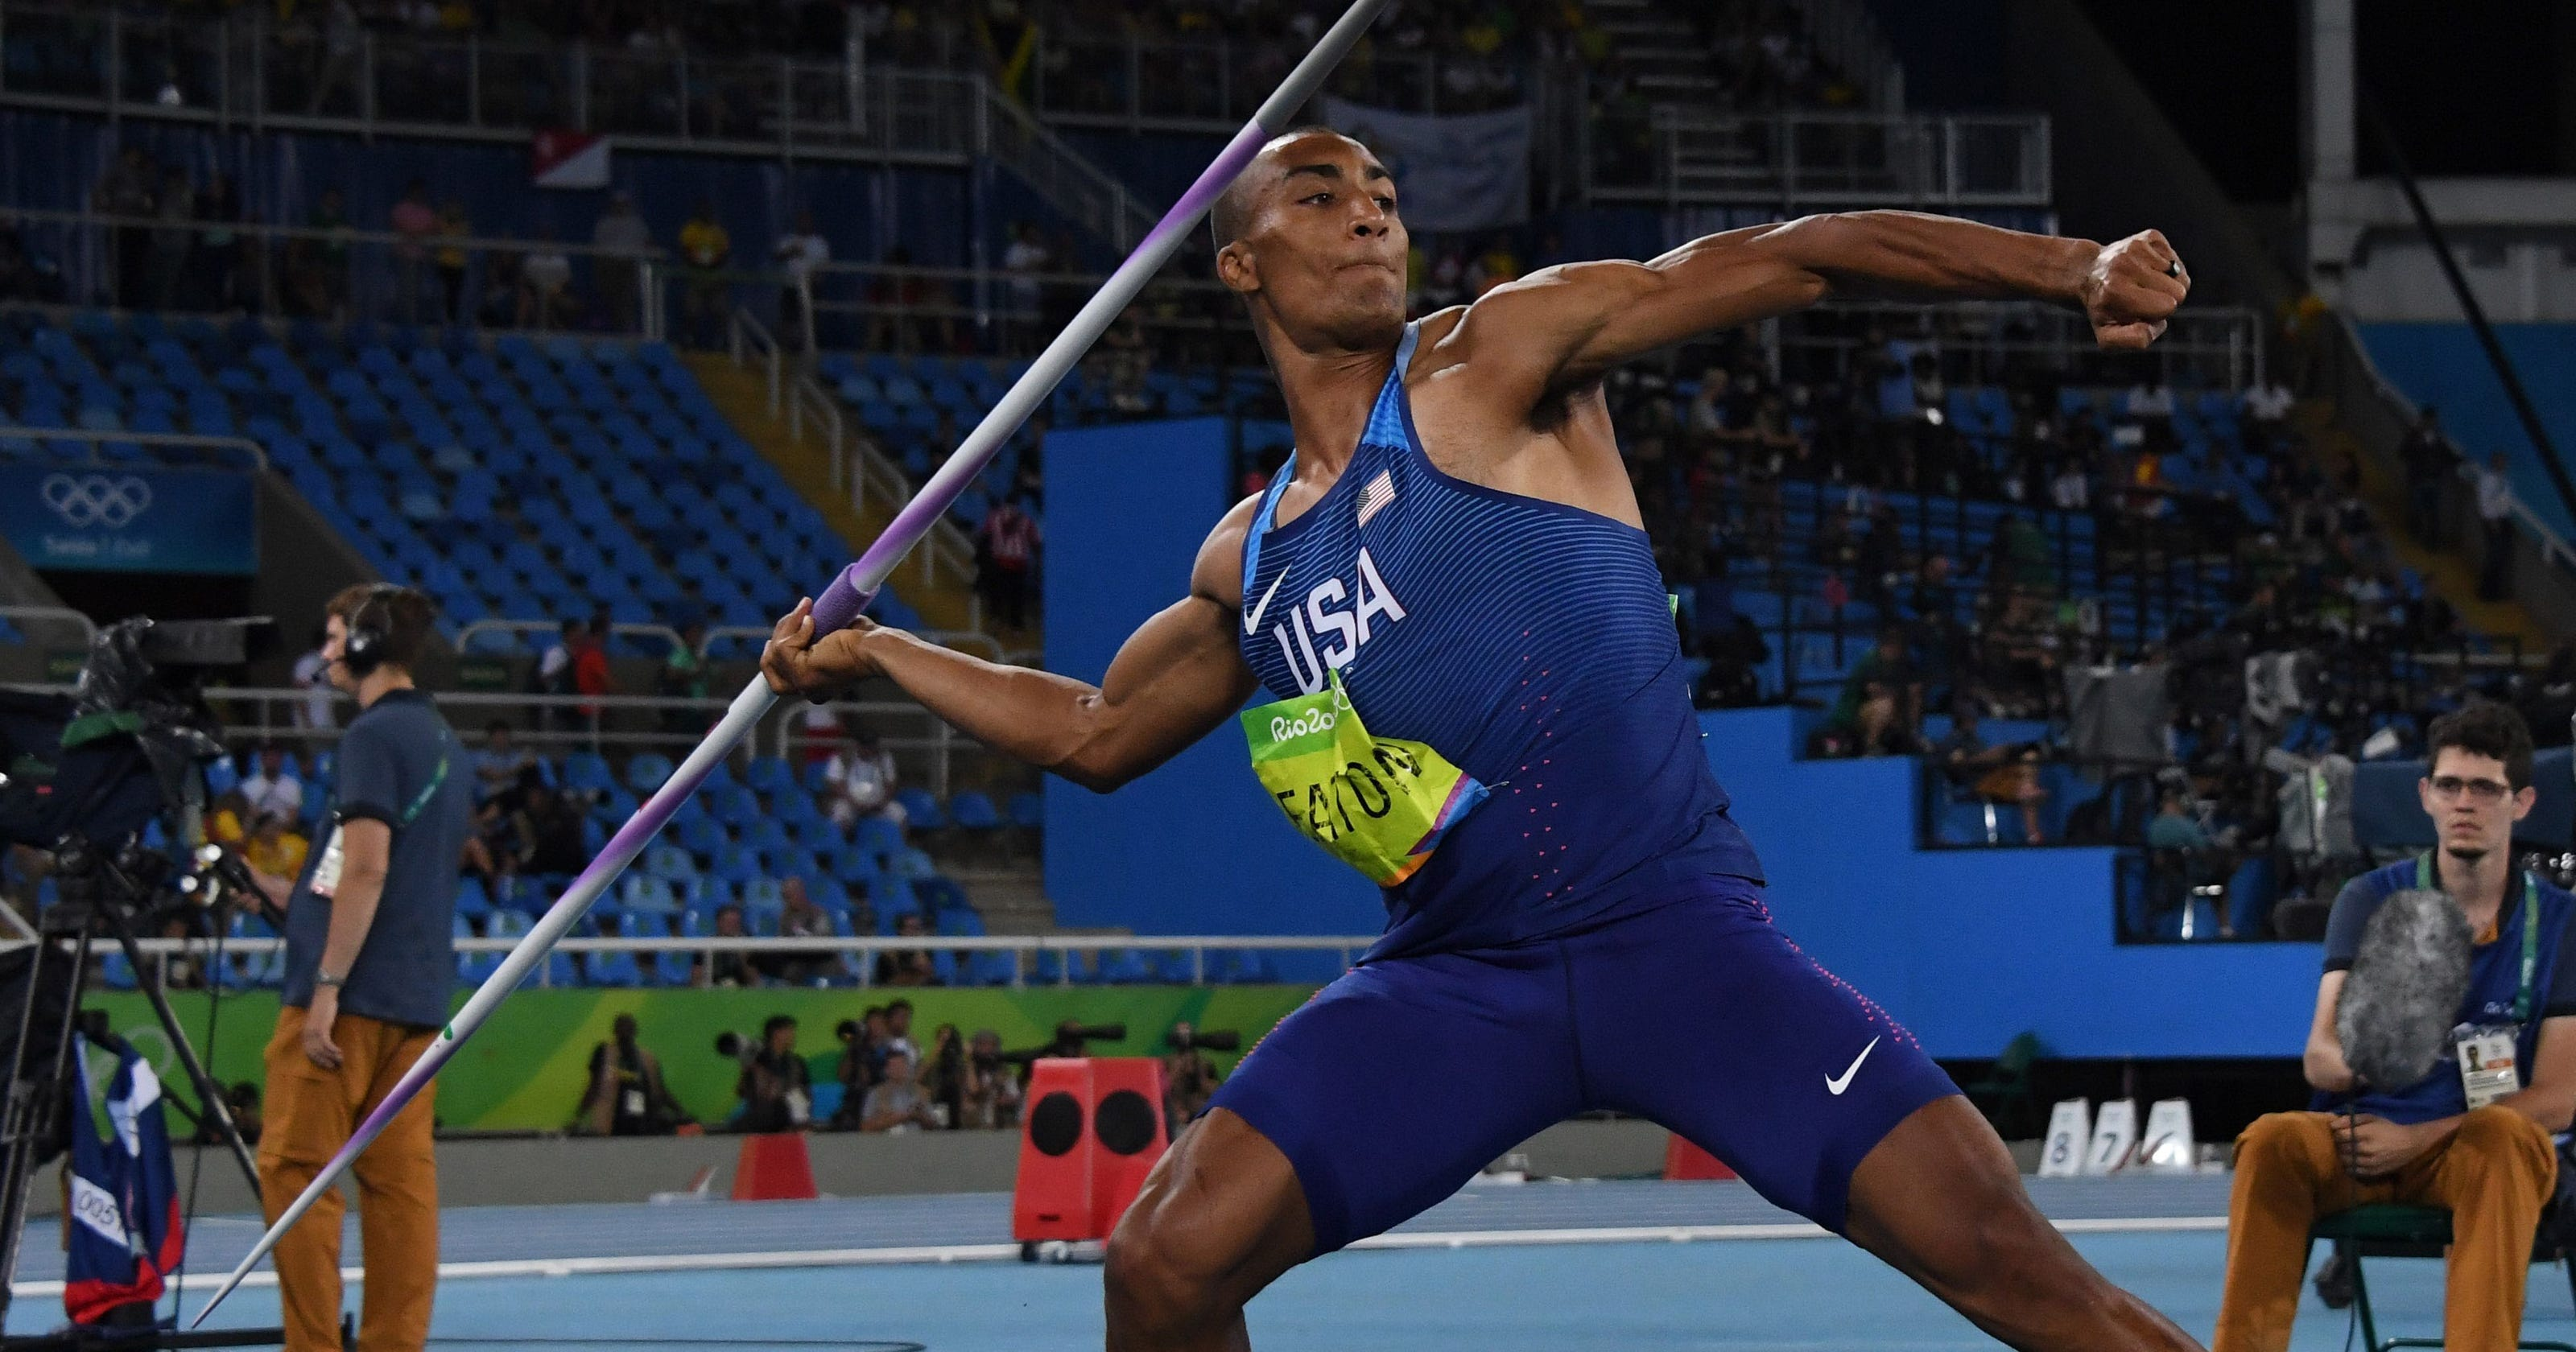 Javeline Kreedon events in athletics